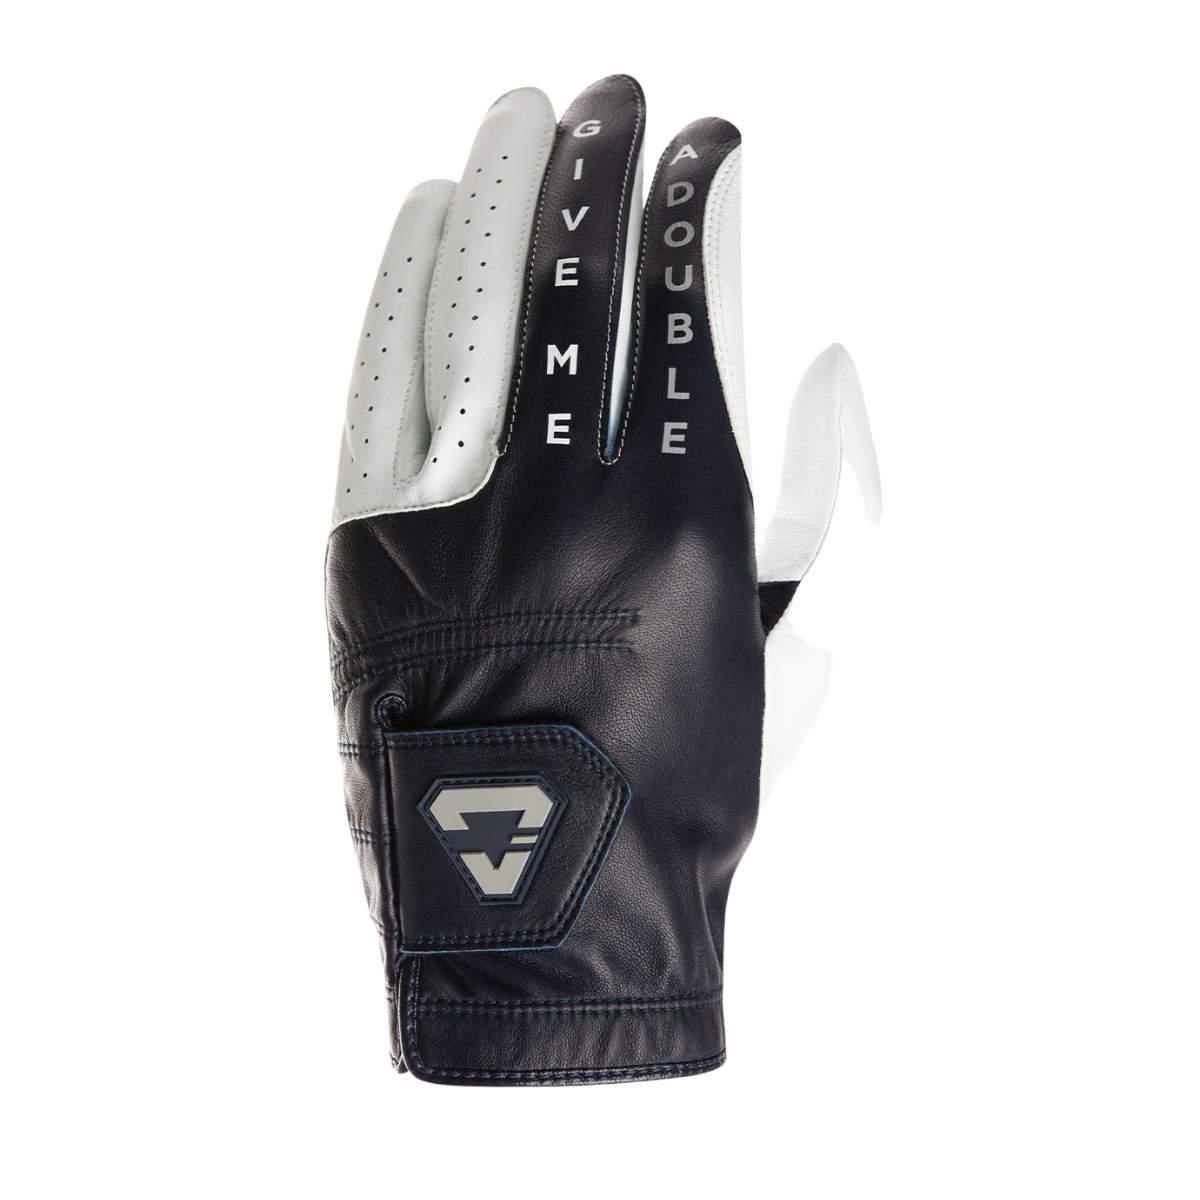 TravisMathew Double Me Golf Glove - Right Hand Regular